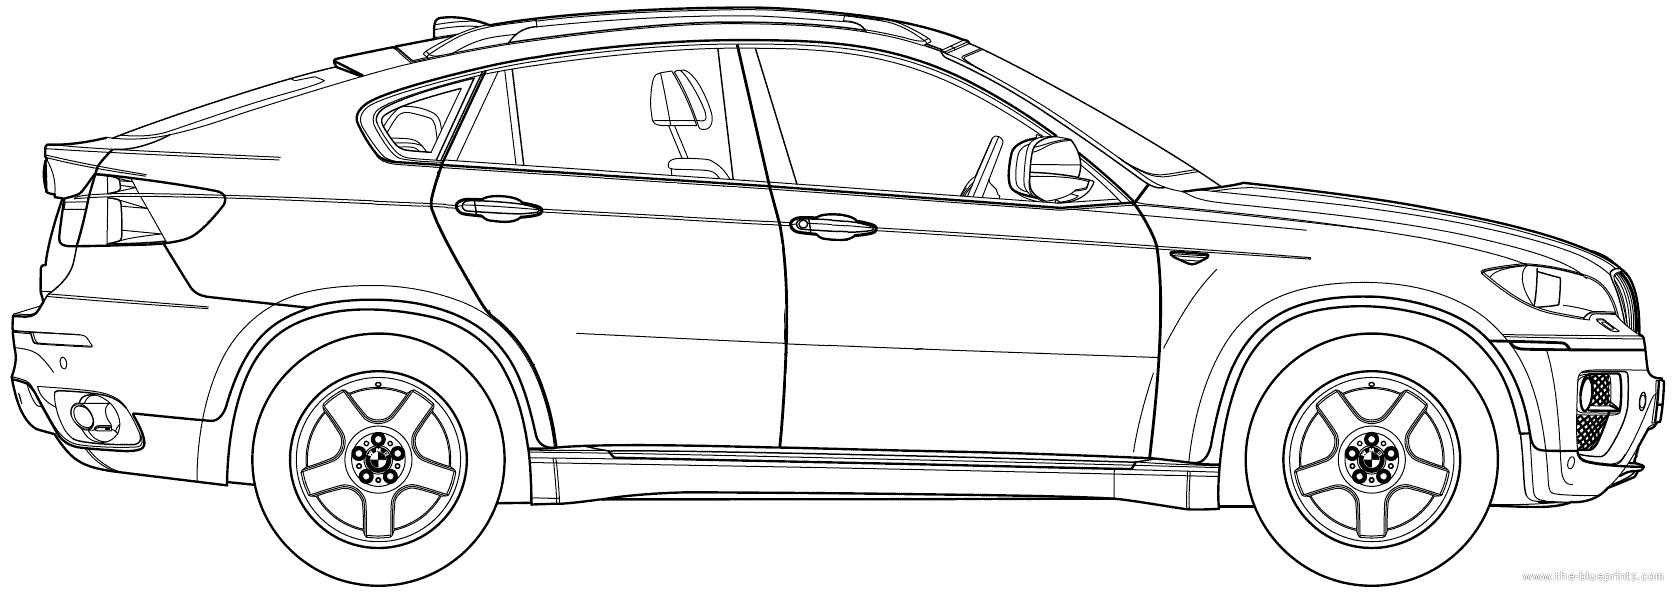 1936 Ford Wiring Diagram. Ford. Auto Fuse Box Diagram